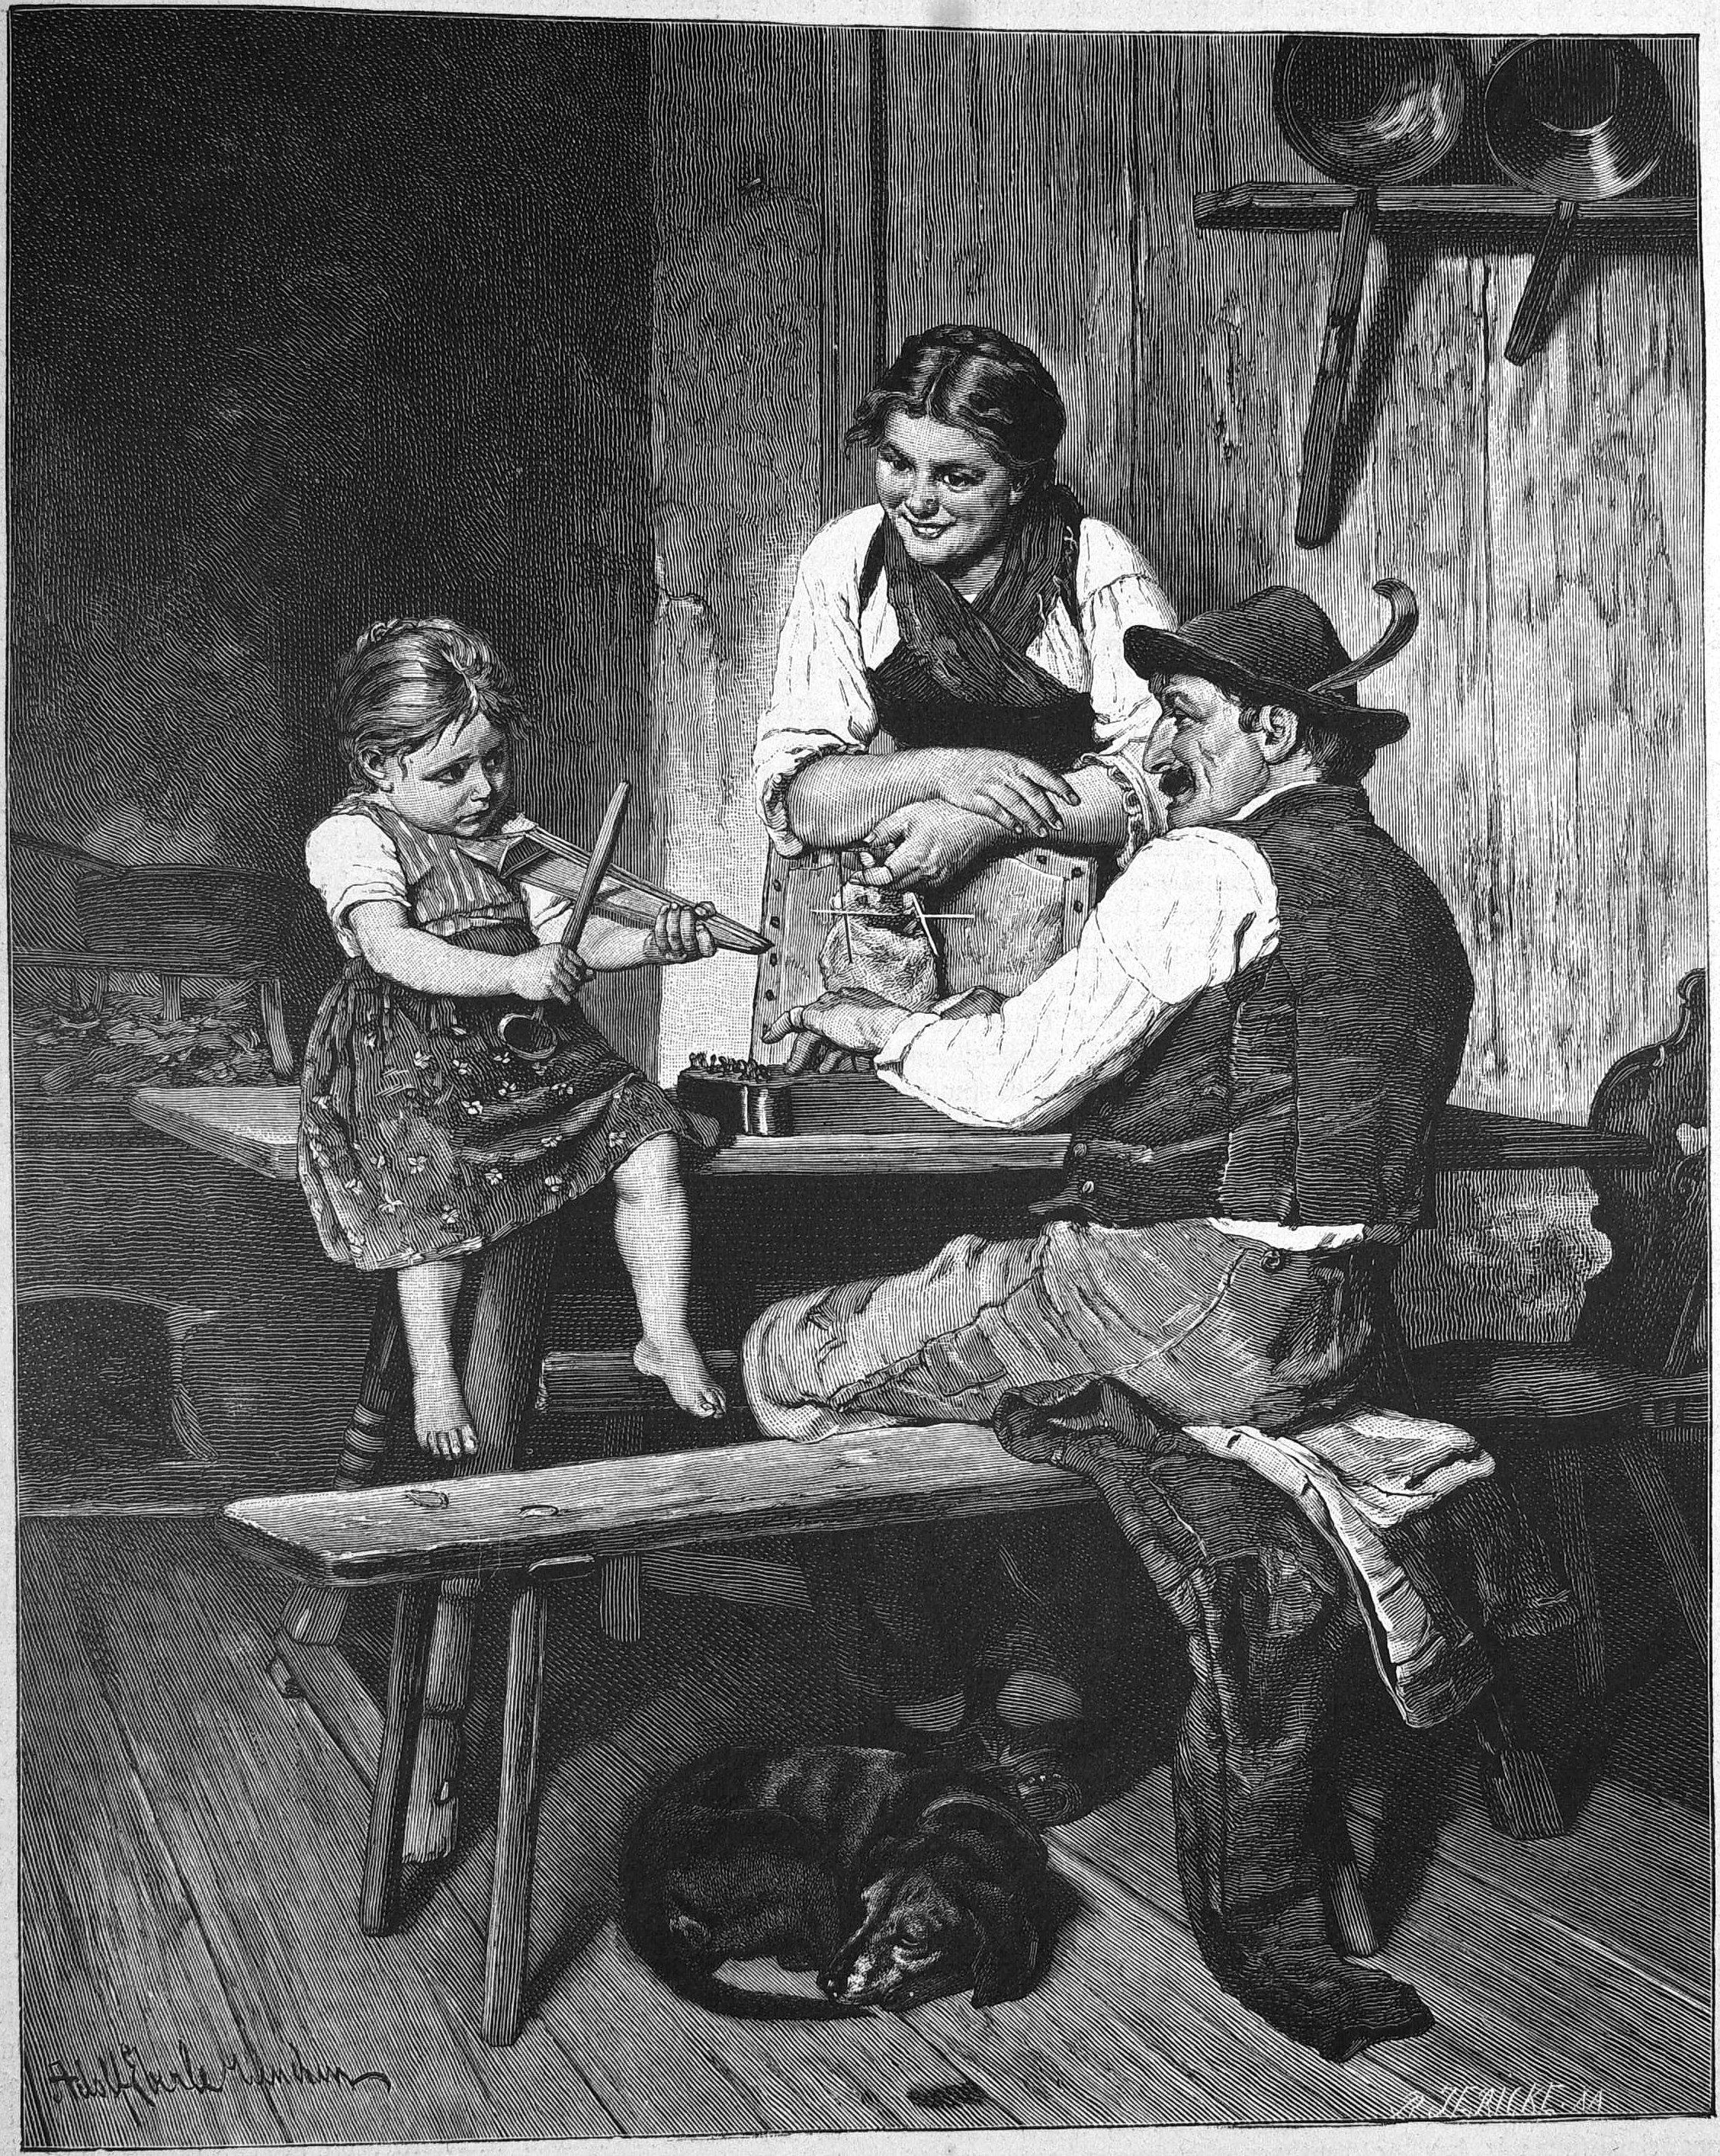 Die_Gartenlaube_(1885)_b_293